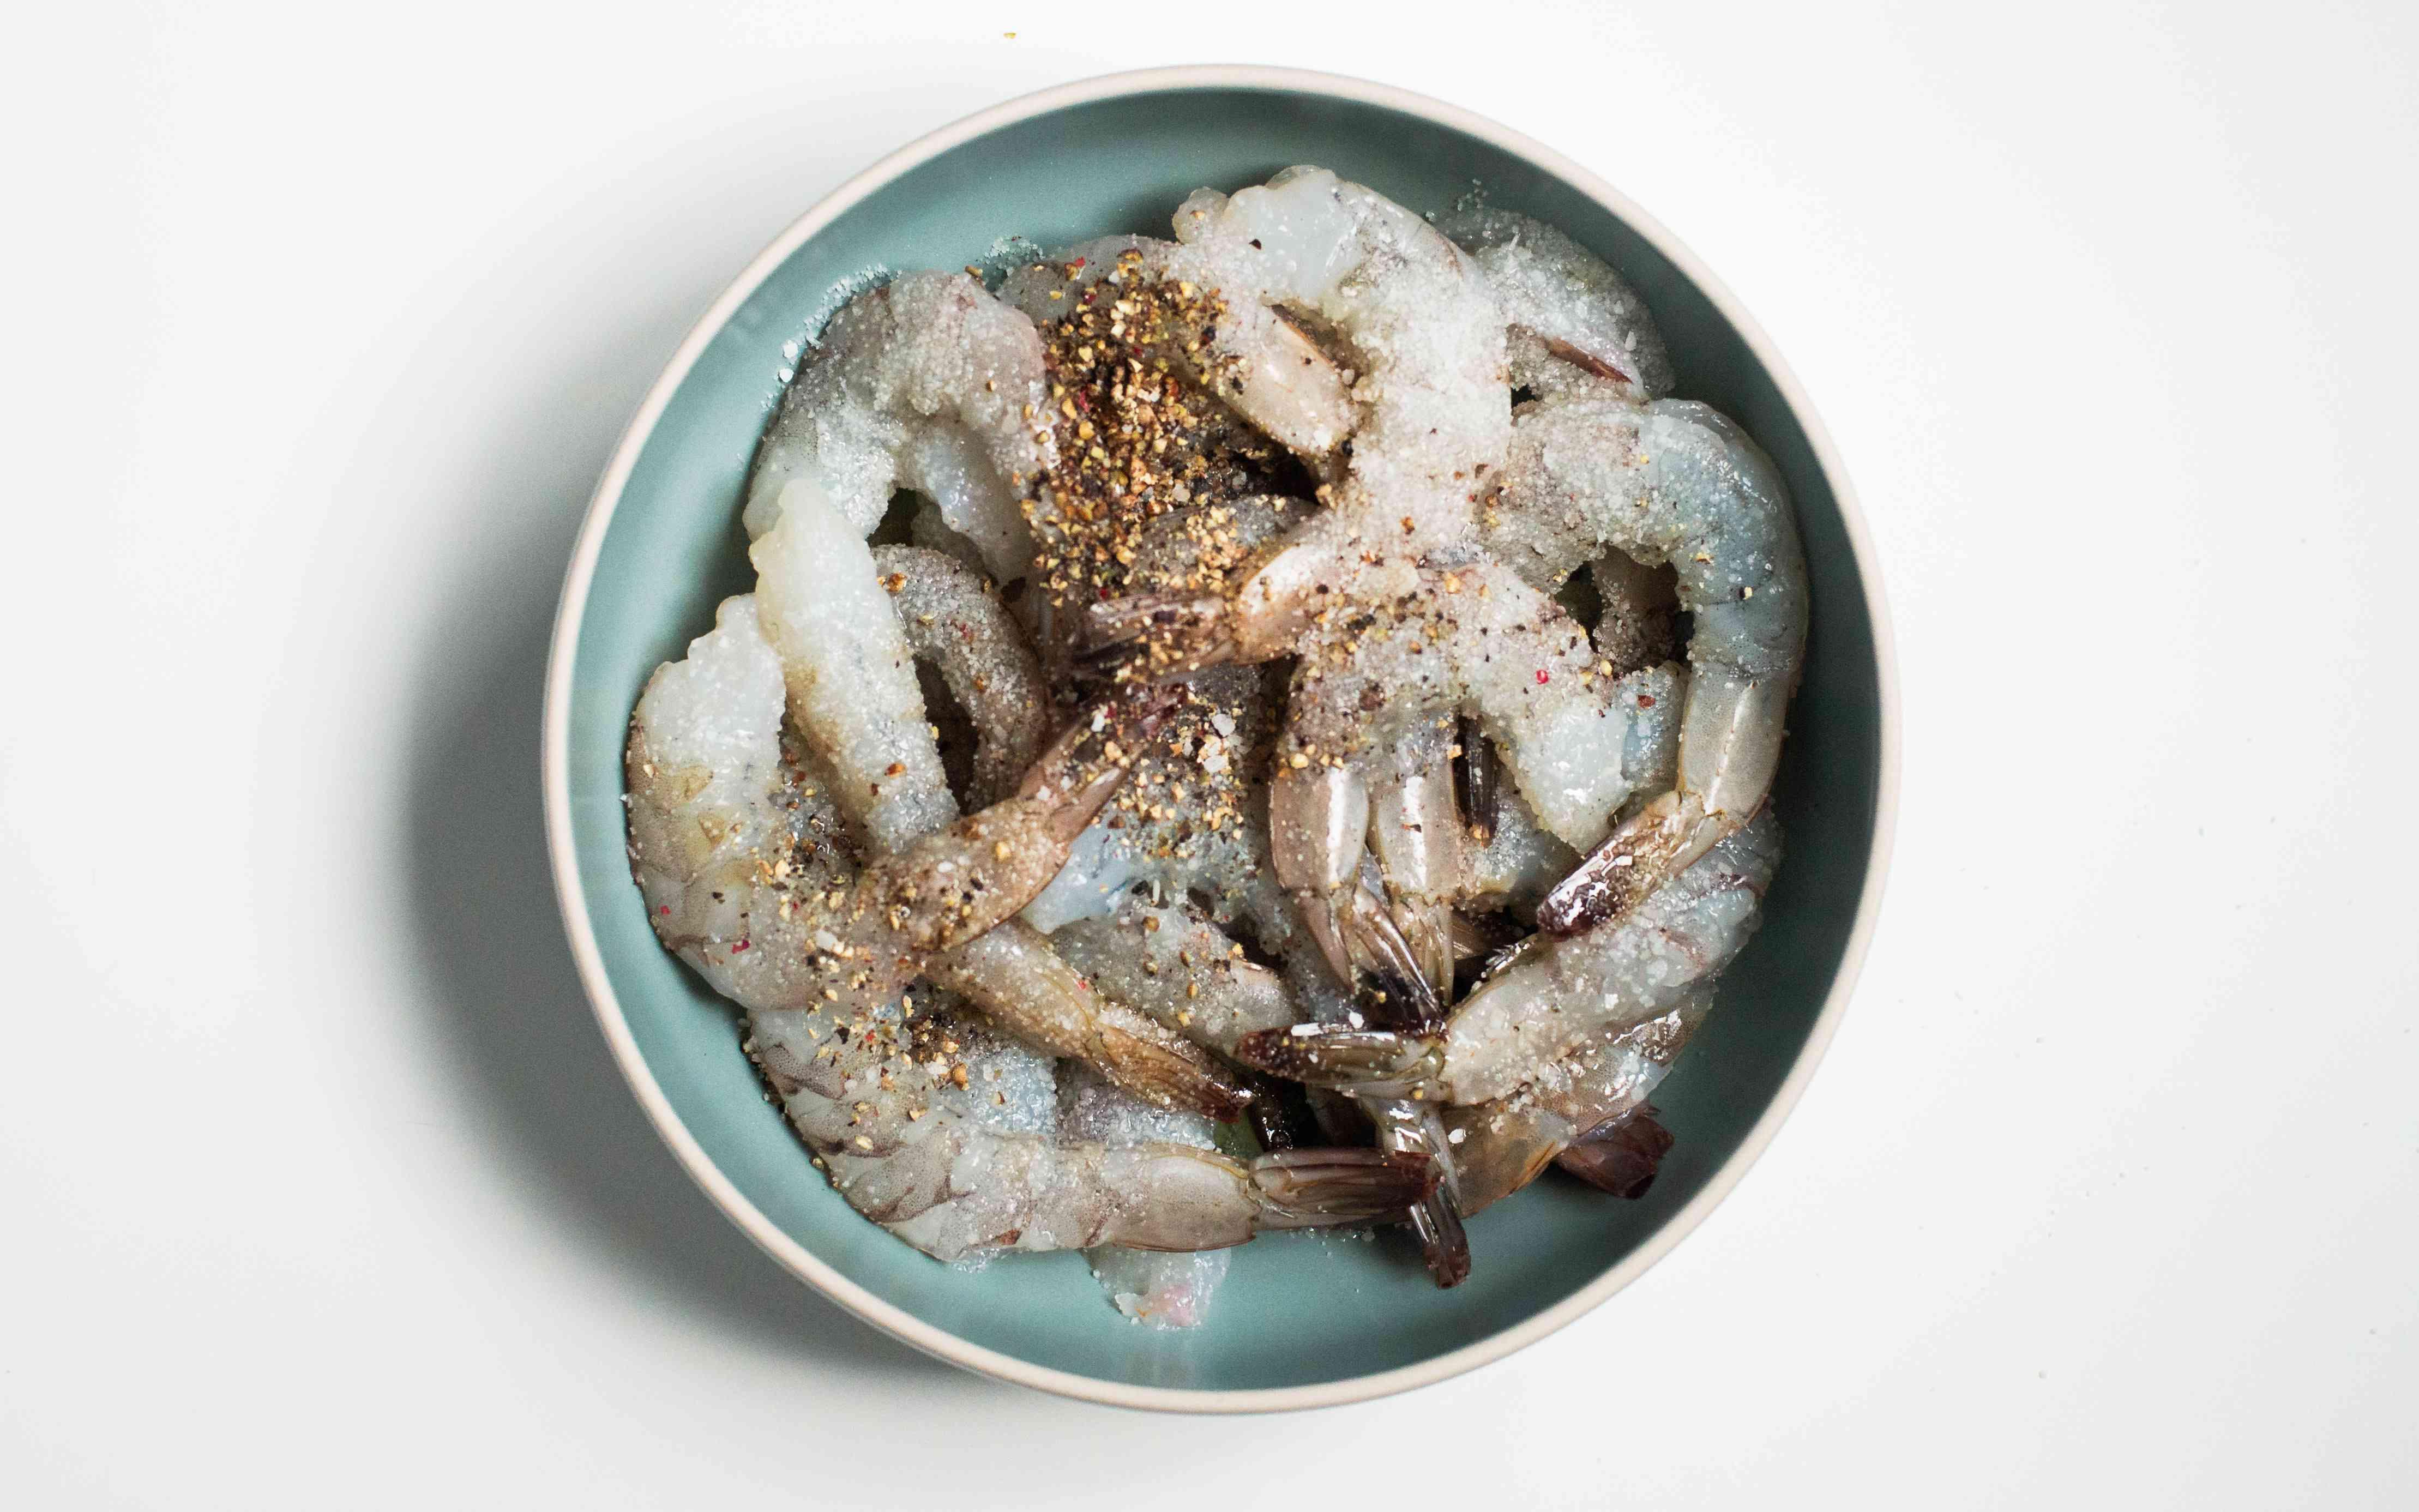 Combine shrimp with seasonings